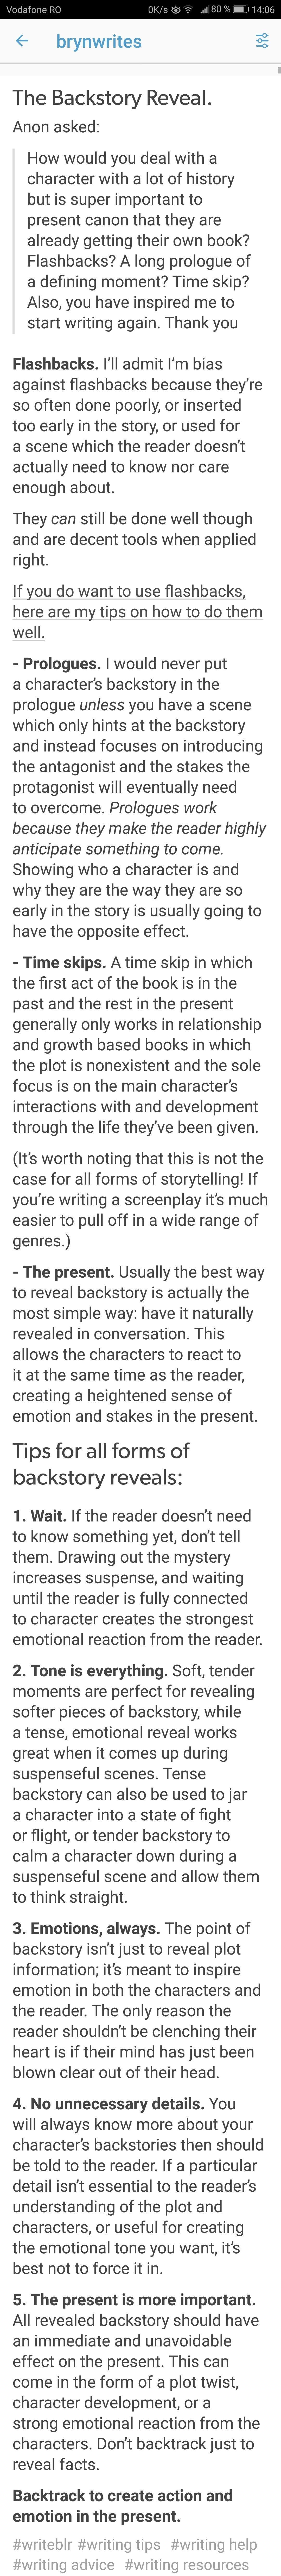 Best post I've seen on backstory  #4 is super hard | writing